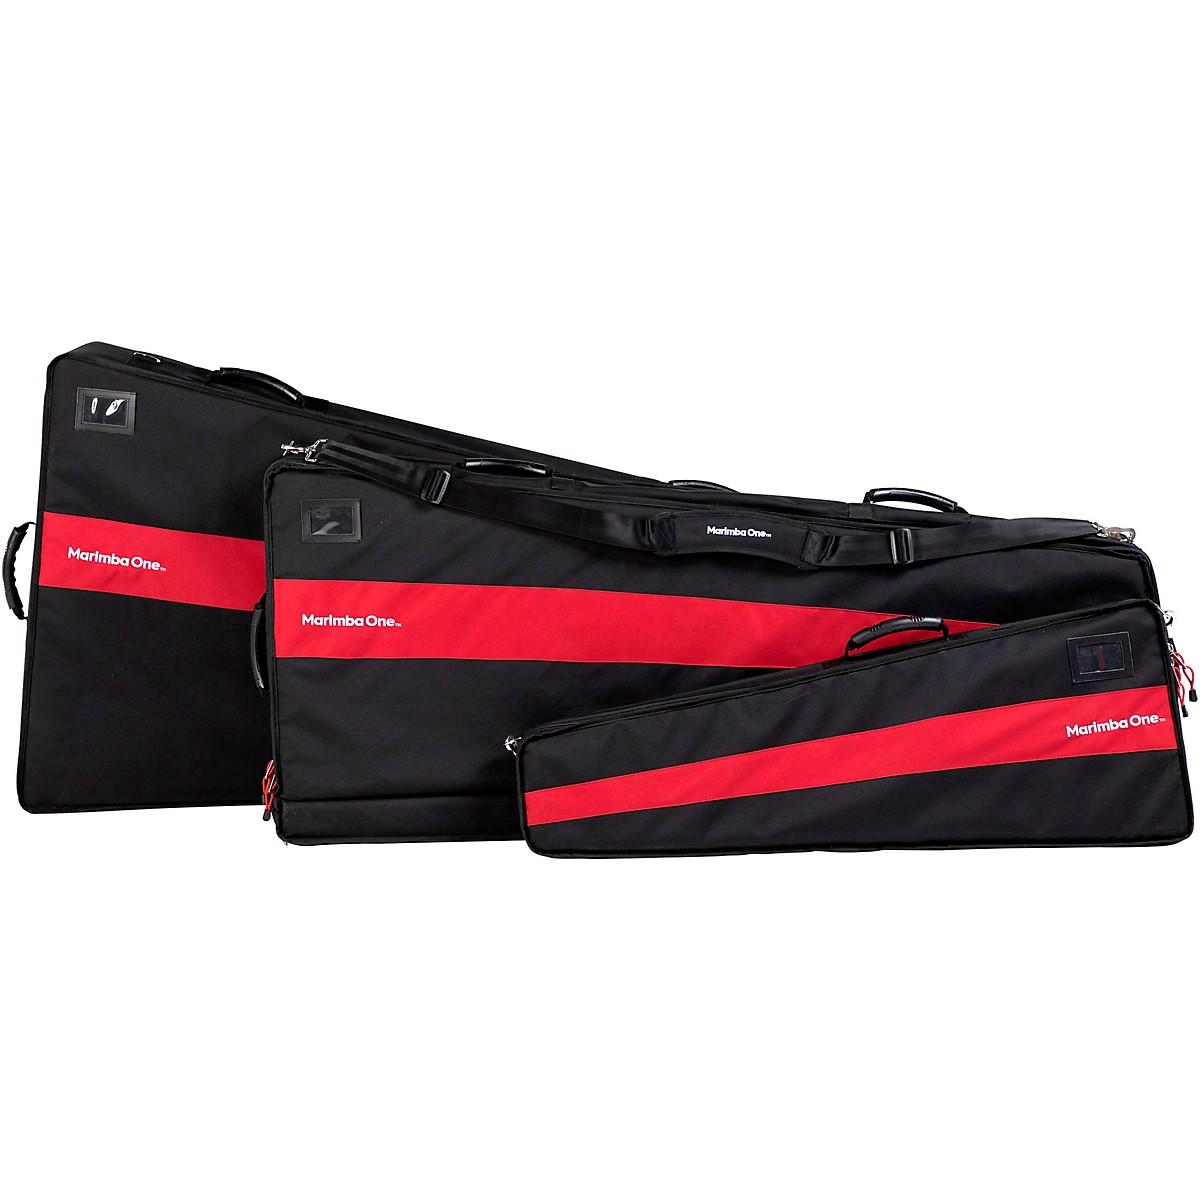 Marimba One One Vibe Vibraphone Cases